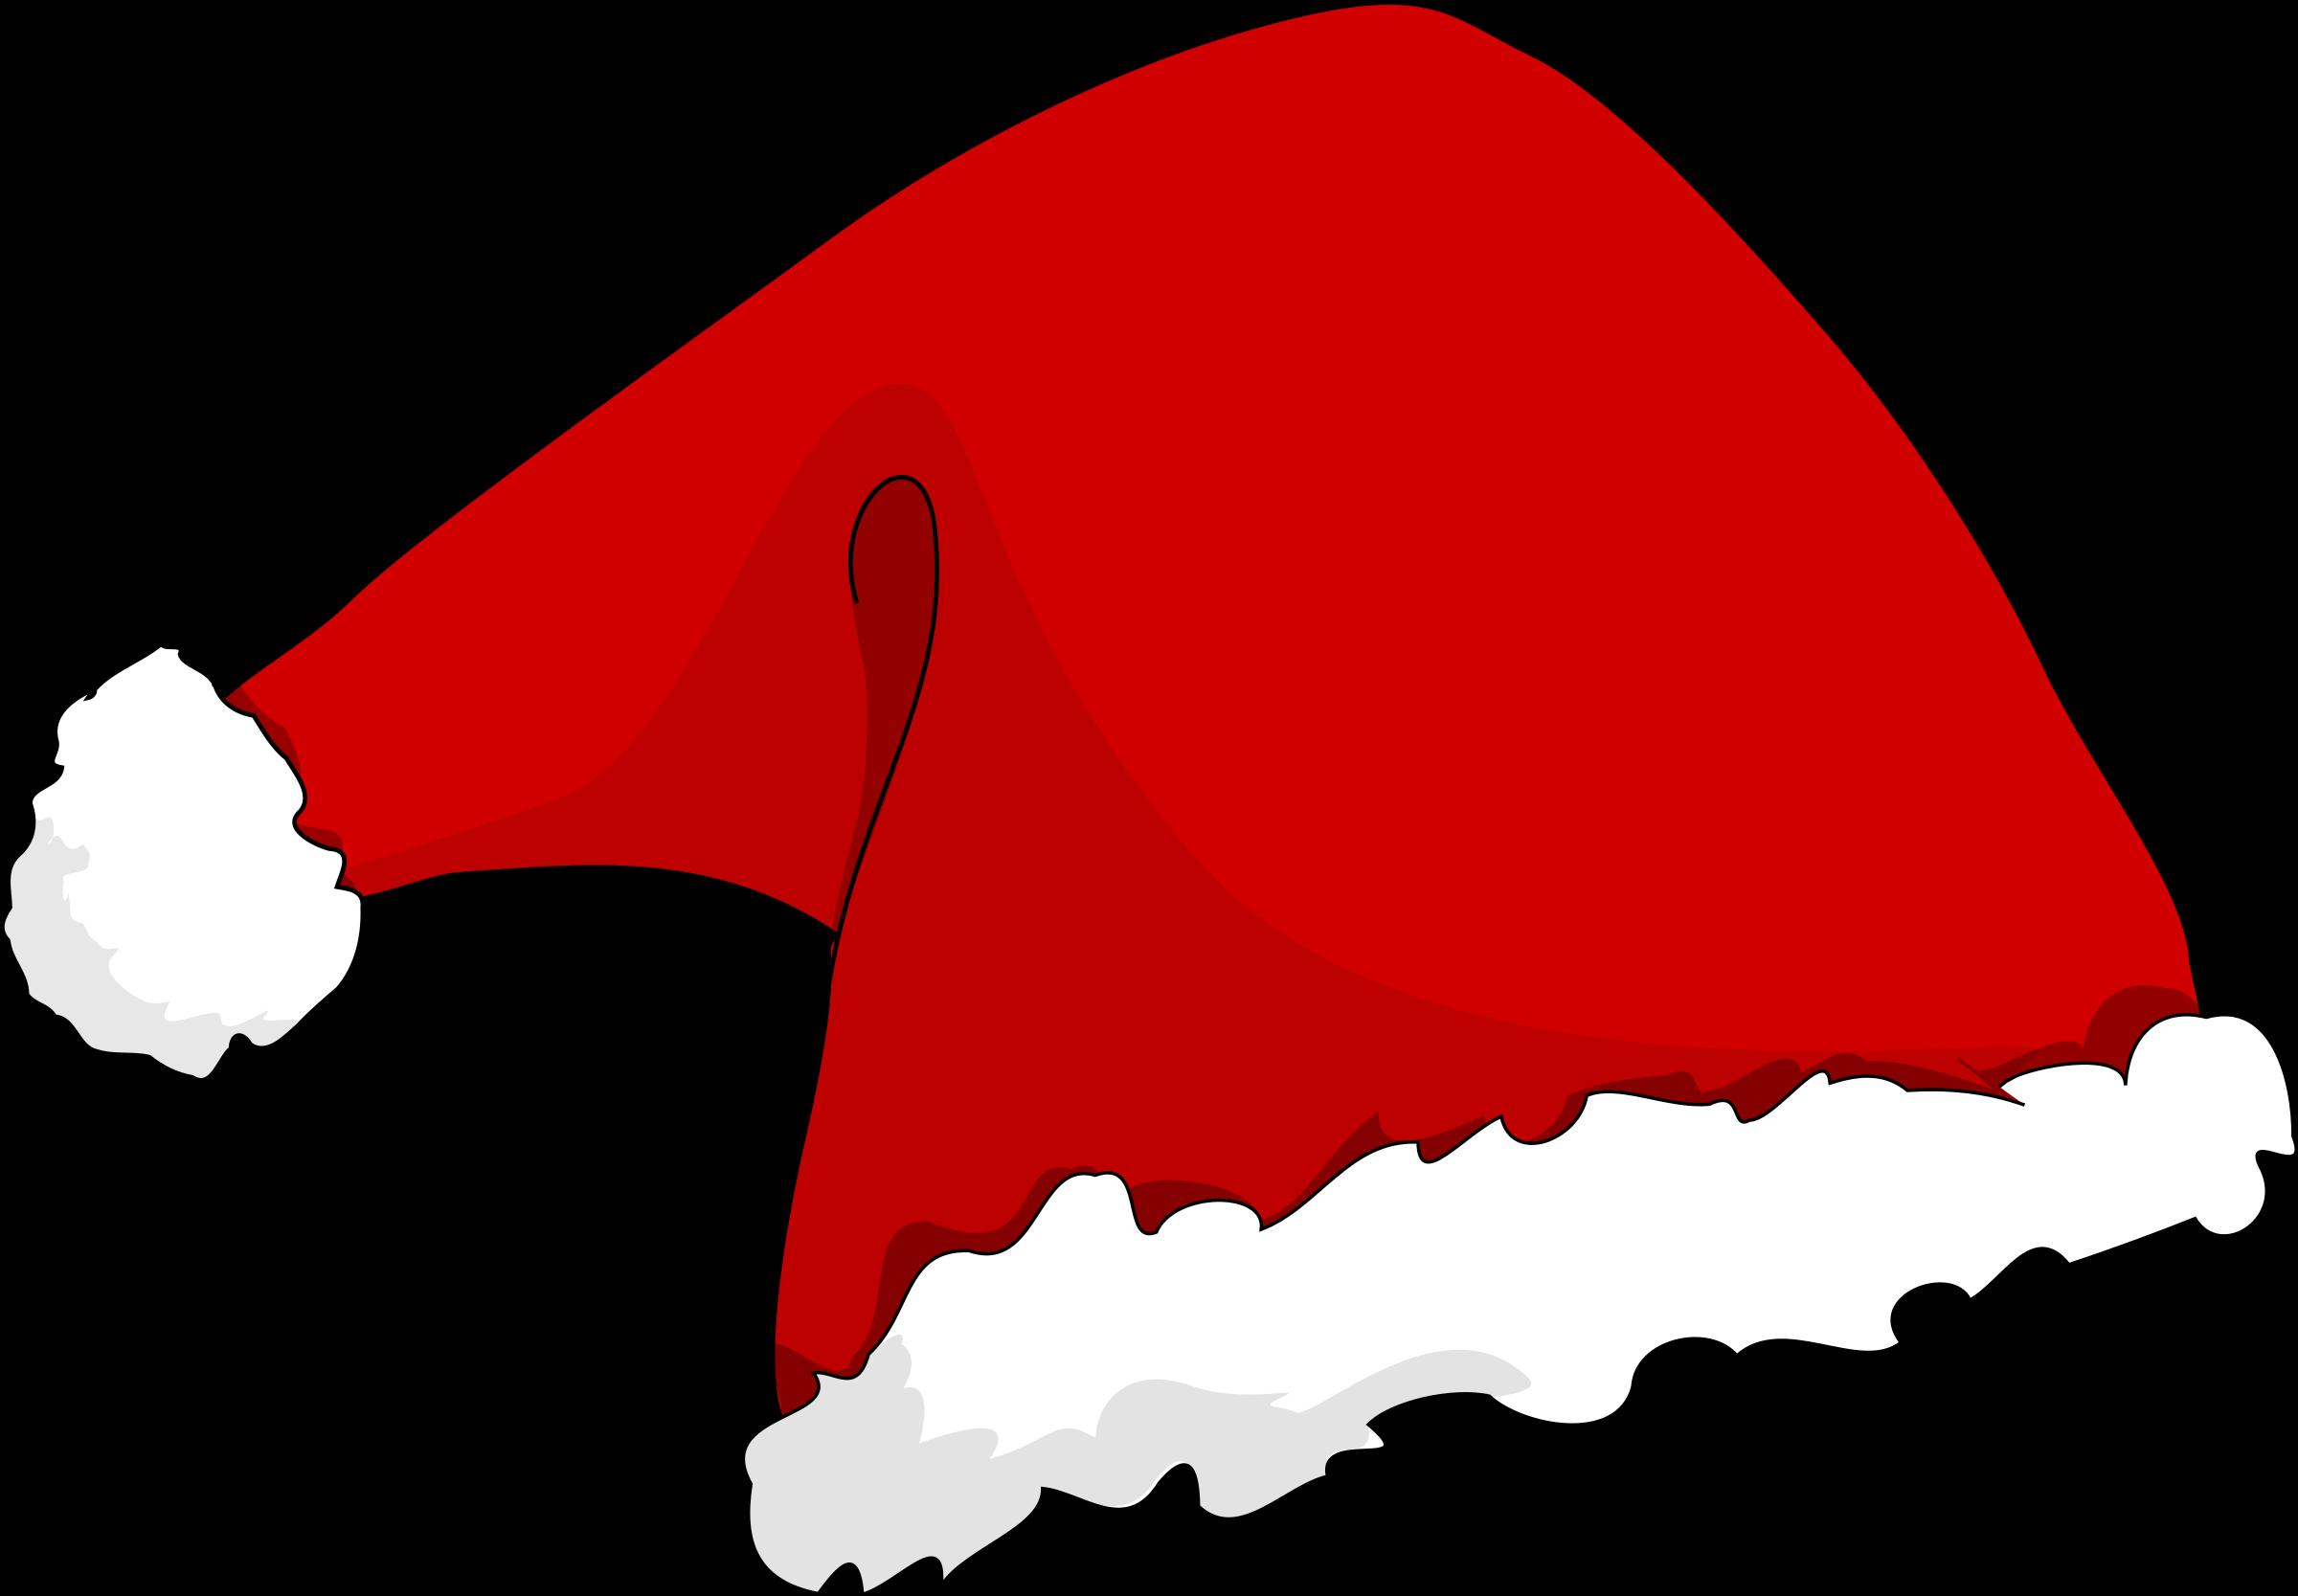 cartoon santa hat png rh clipart info santa hat cartoon drawing santa hat cartoon pics